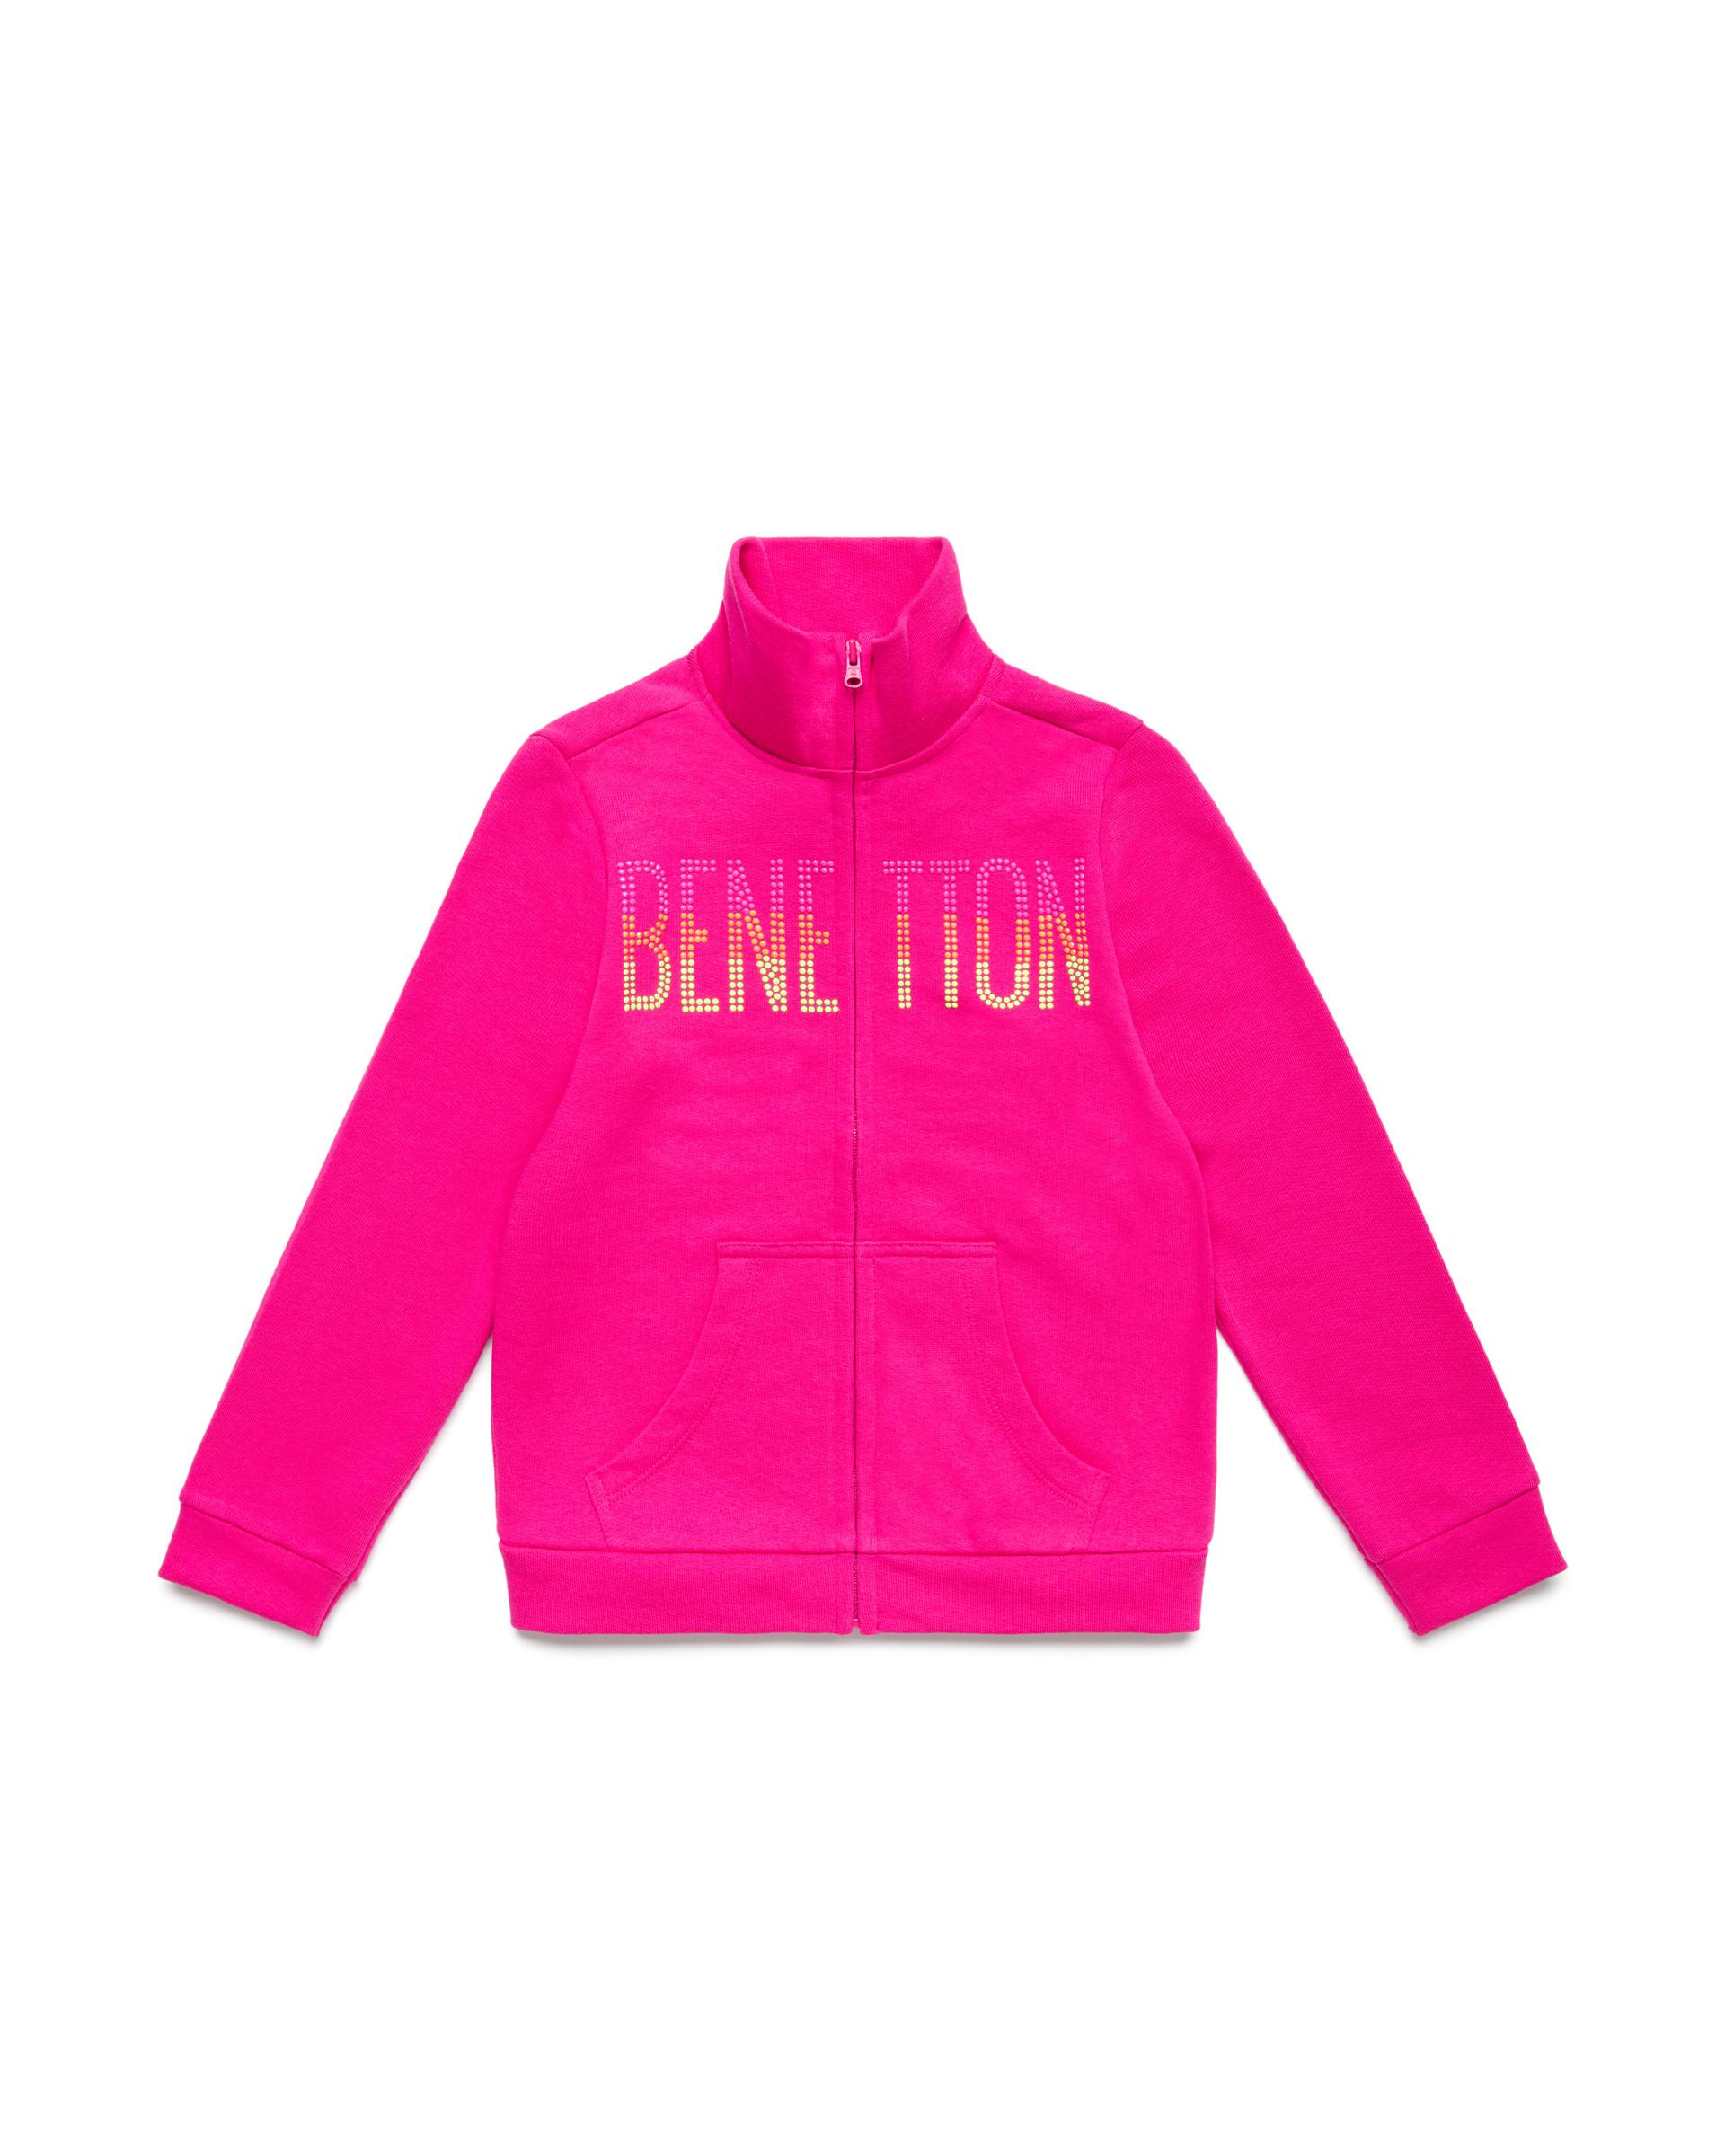 Купить 20P_3J68C5793_2L3, Толстовка для девочек Benetton 3J68C5793_2L3 р-р 158, United Colors of Benetton, Толстовки для девочек